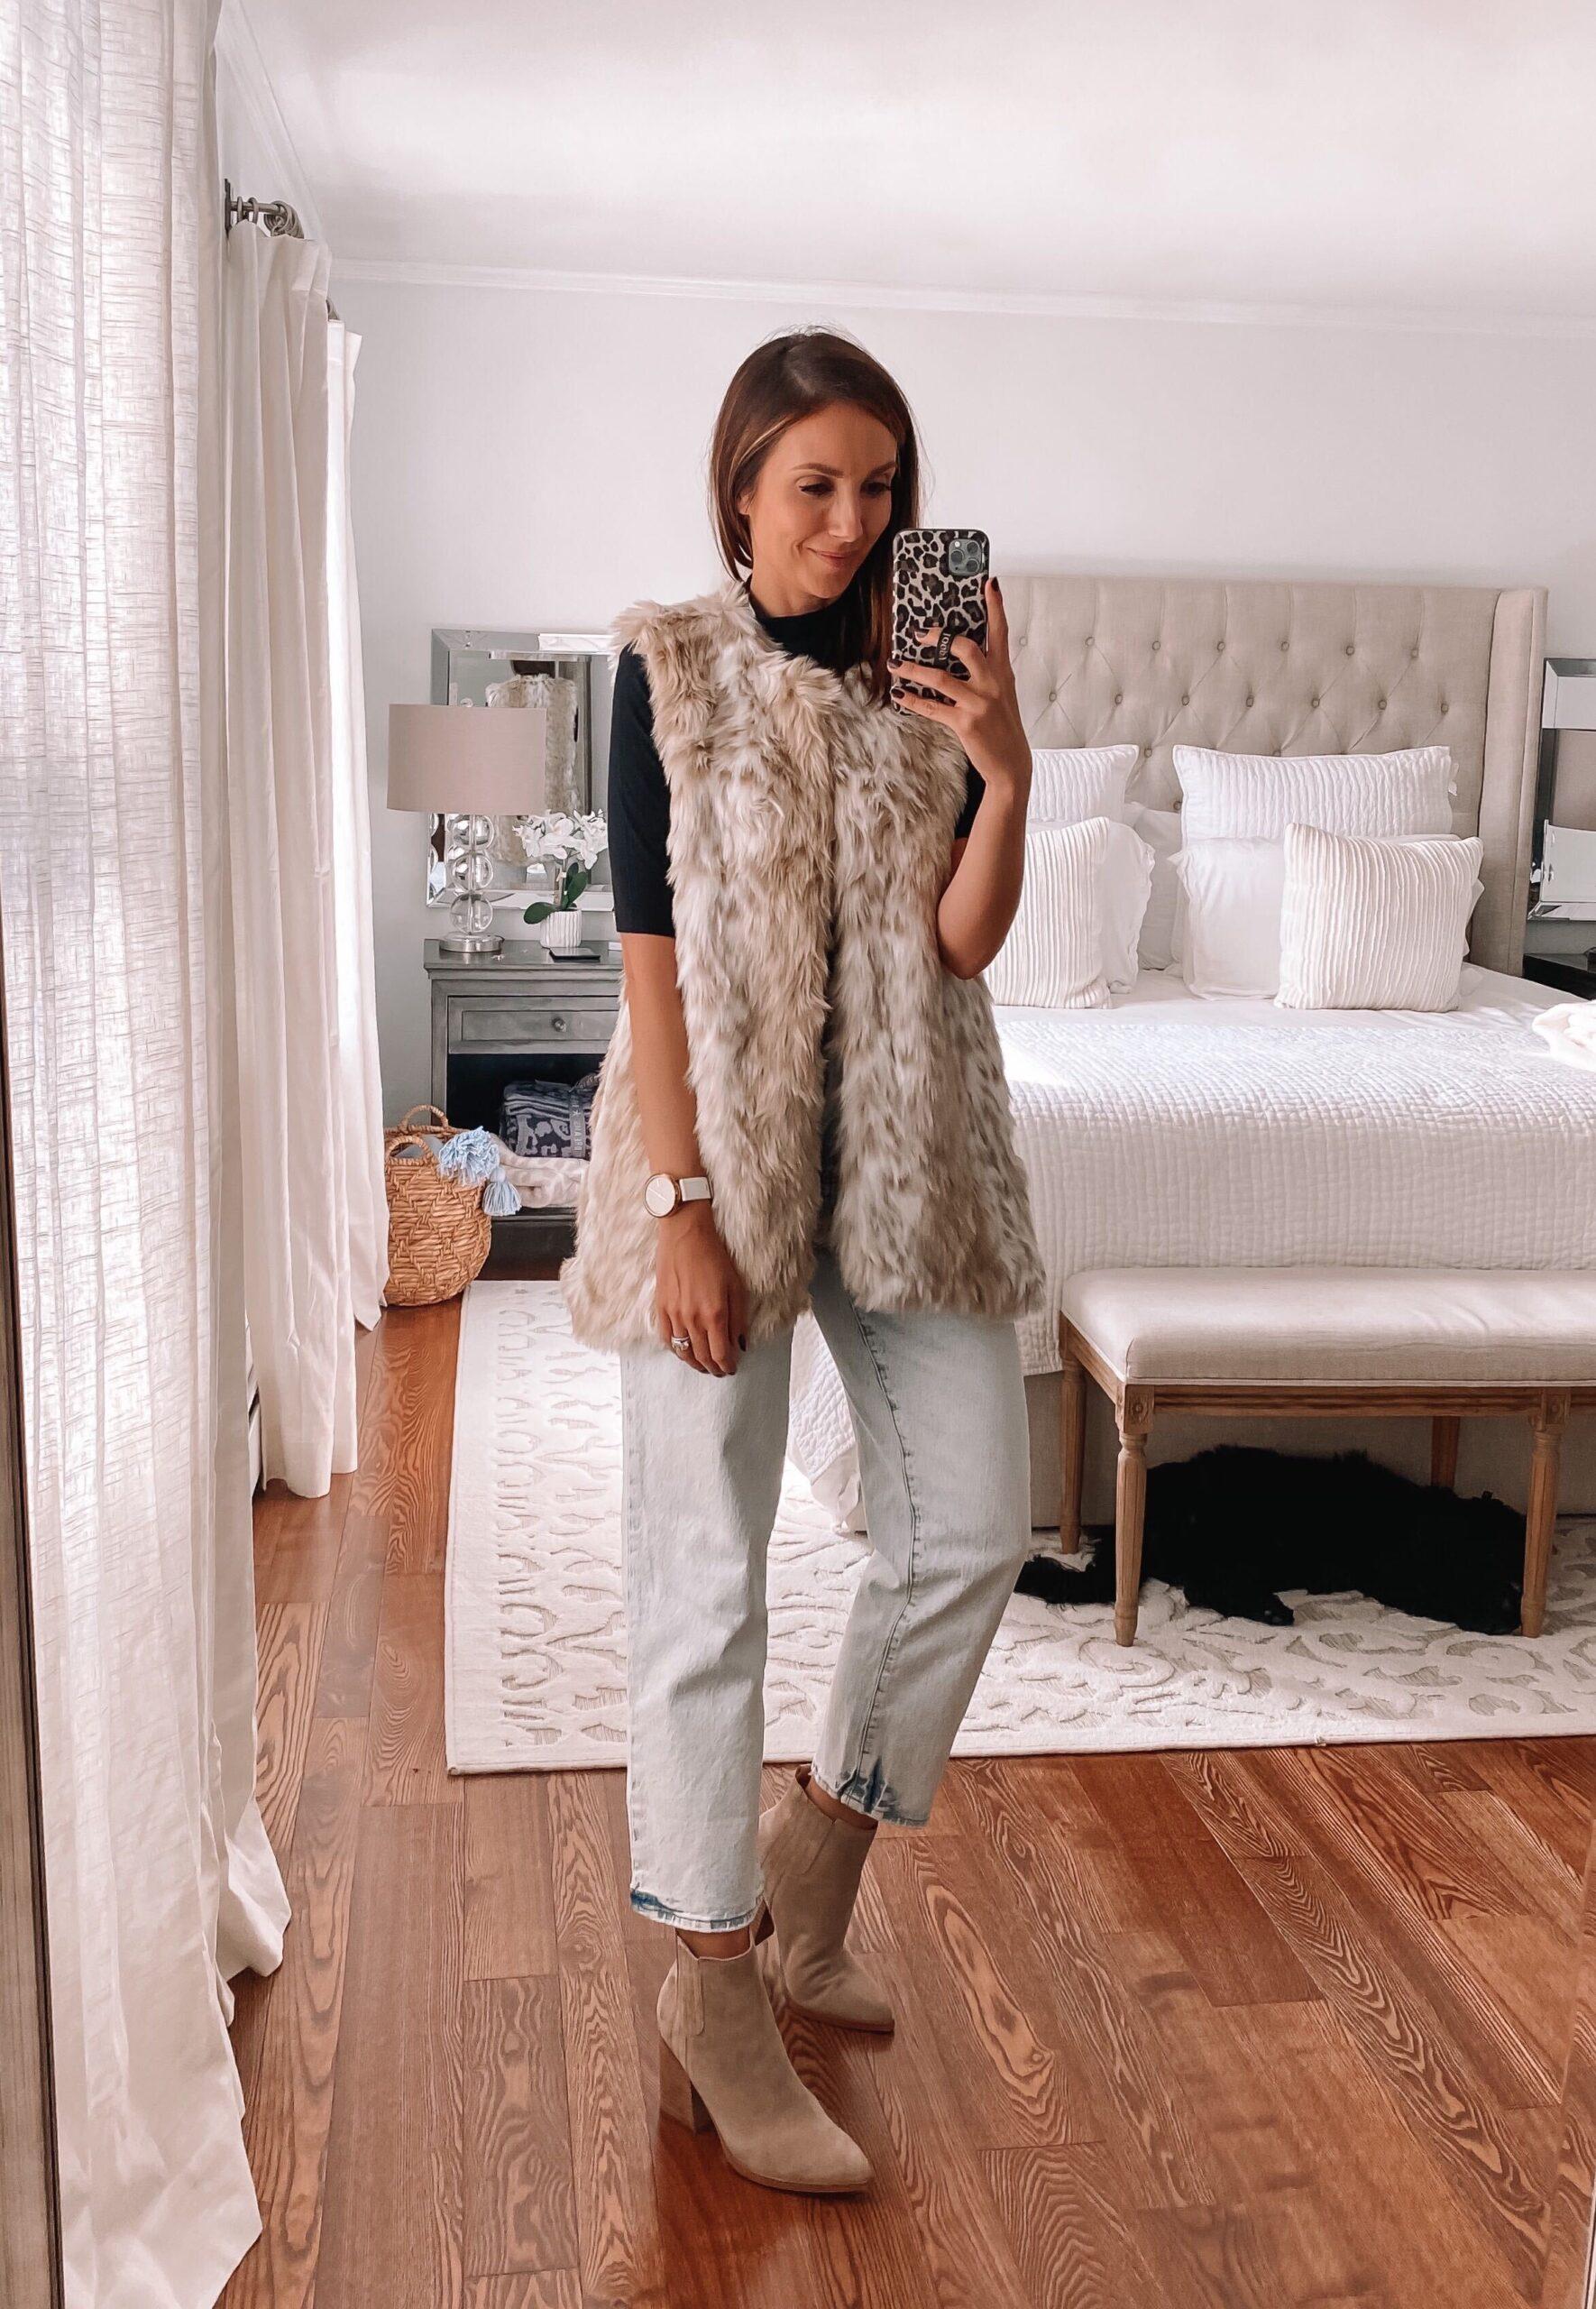 walmart faux fur vest, fall outfit idea, target jean